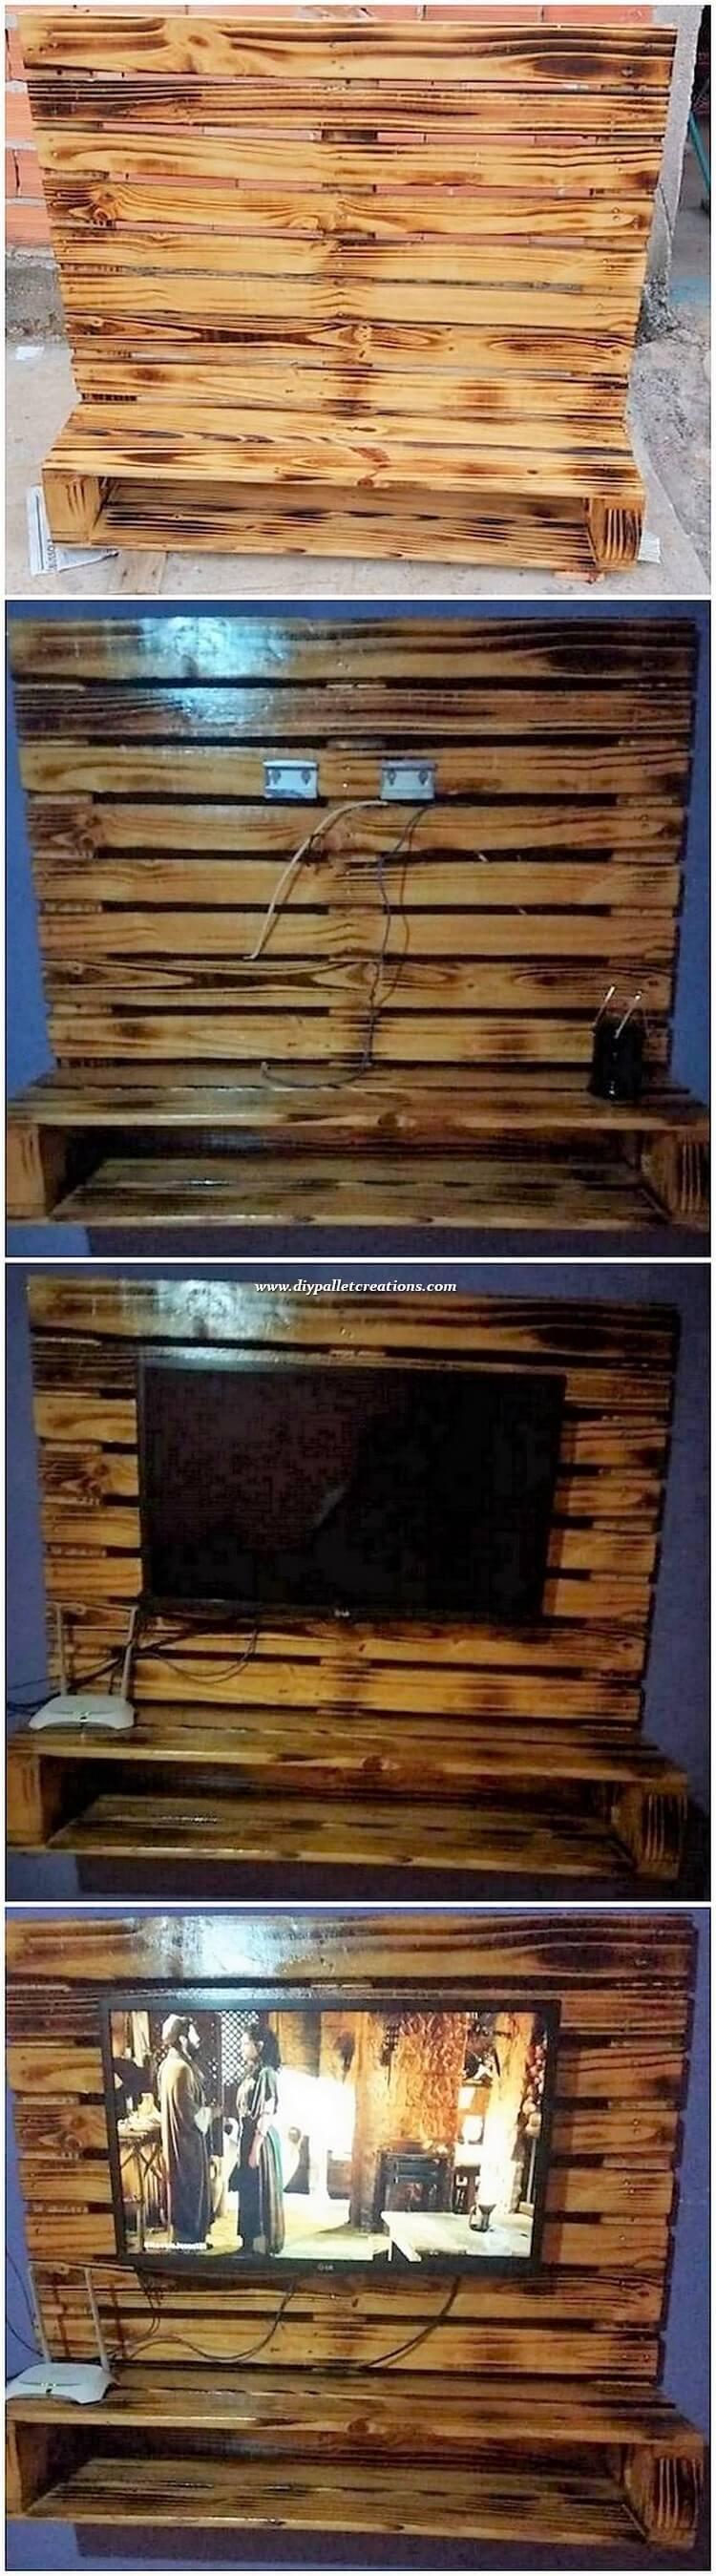 Wood Pallet Wall LED Holder